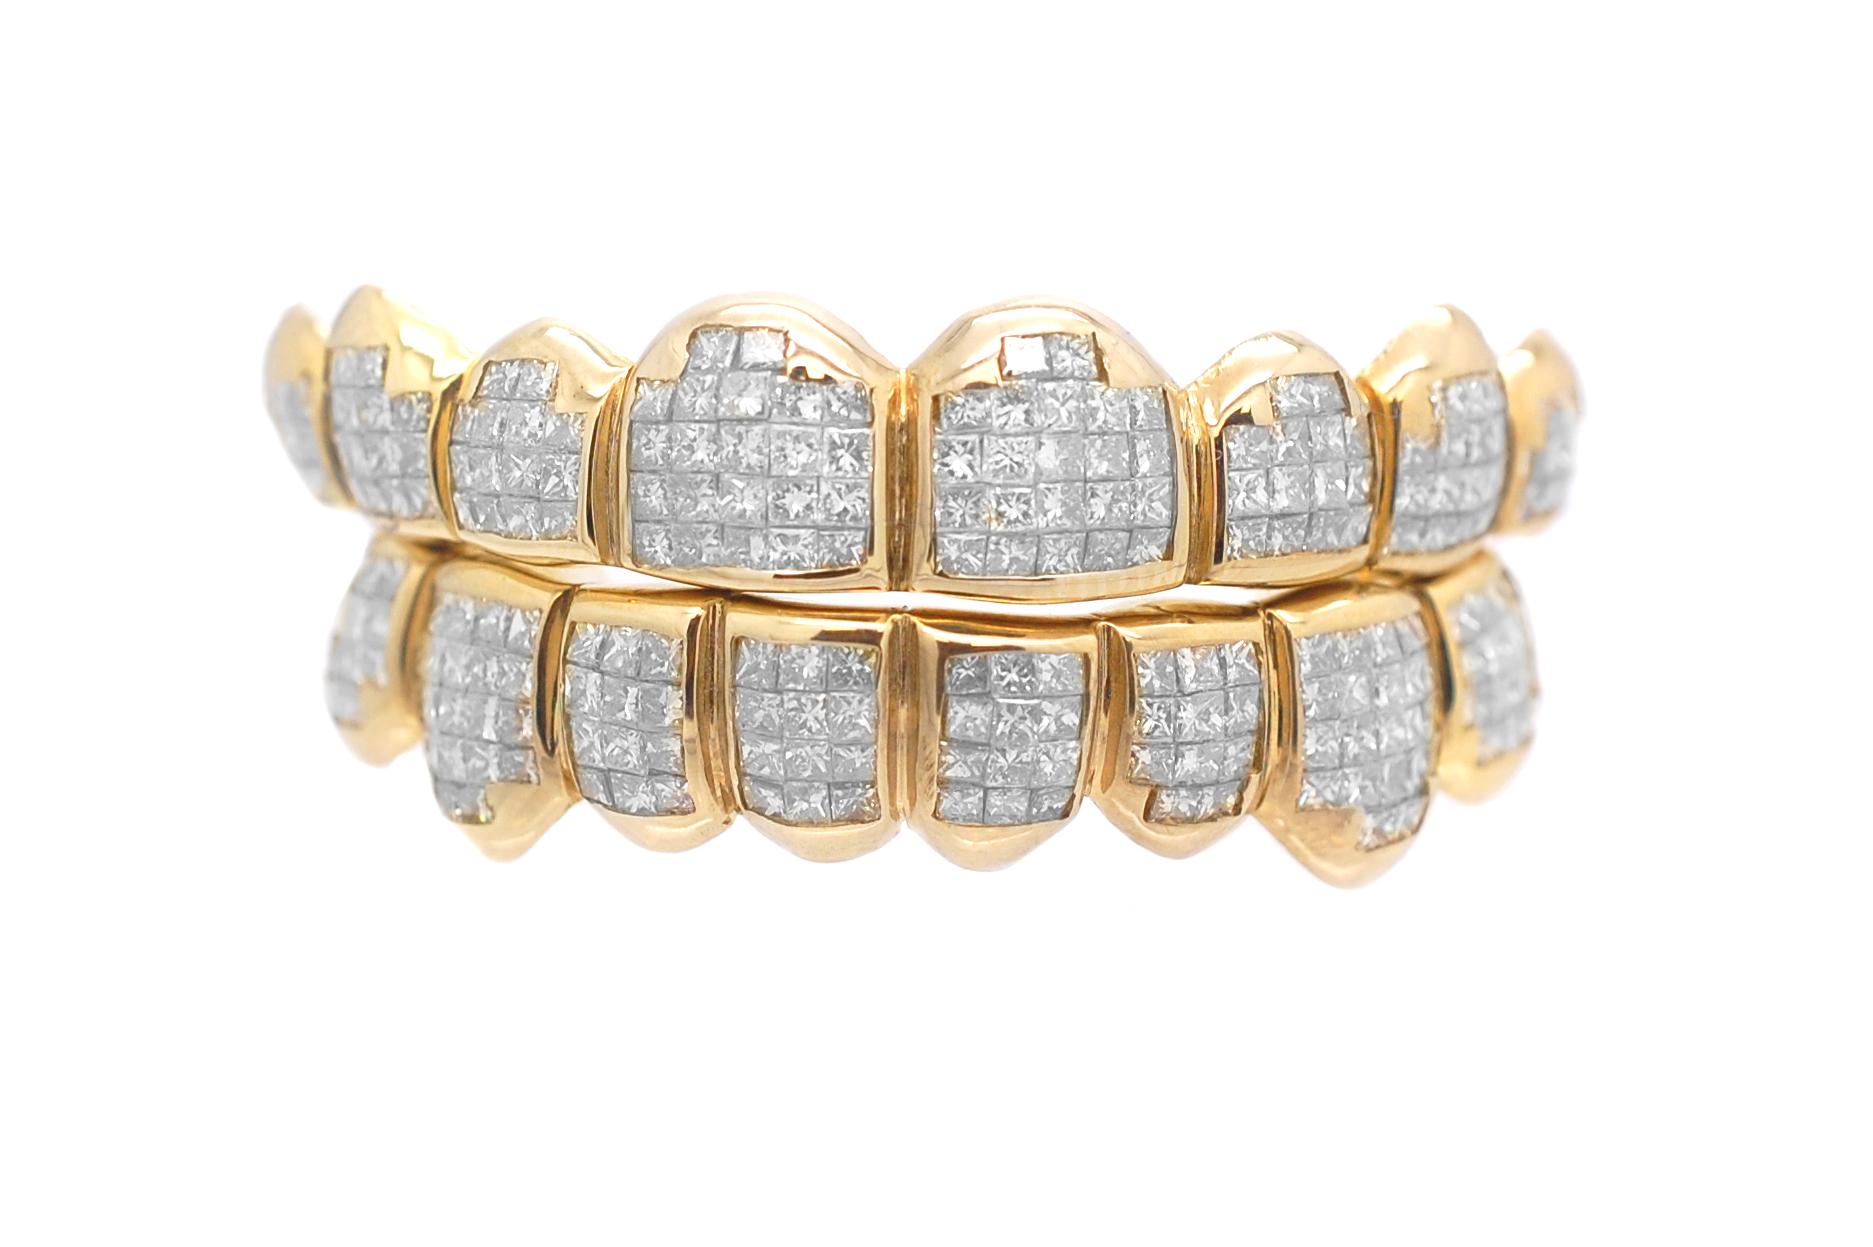 10kt Yellow Gold Mens Round Diamond Charm Charm Pendant (1.1 cttw.)